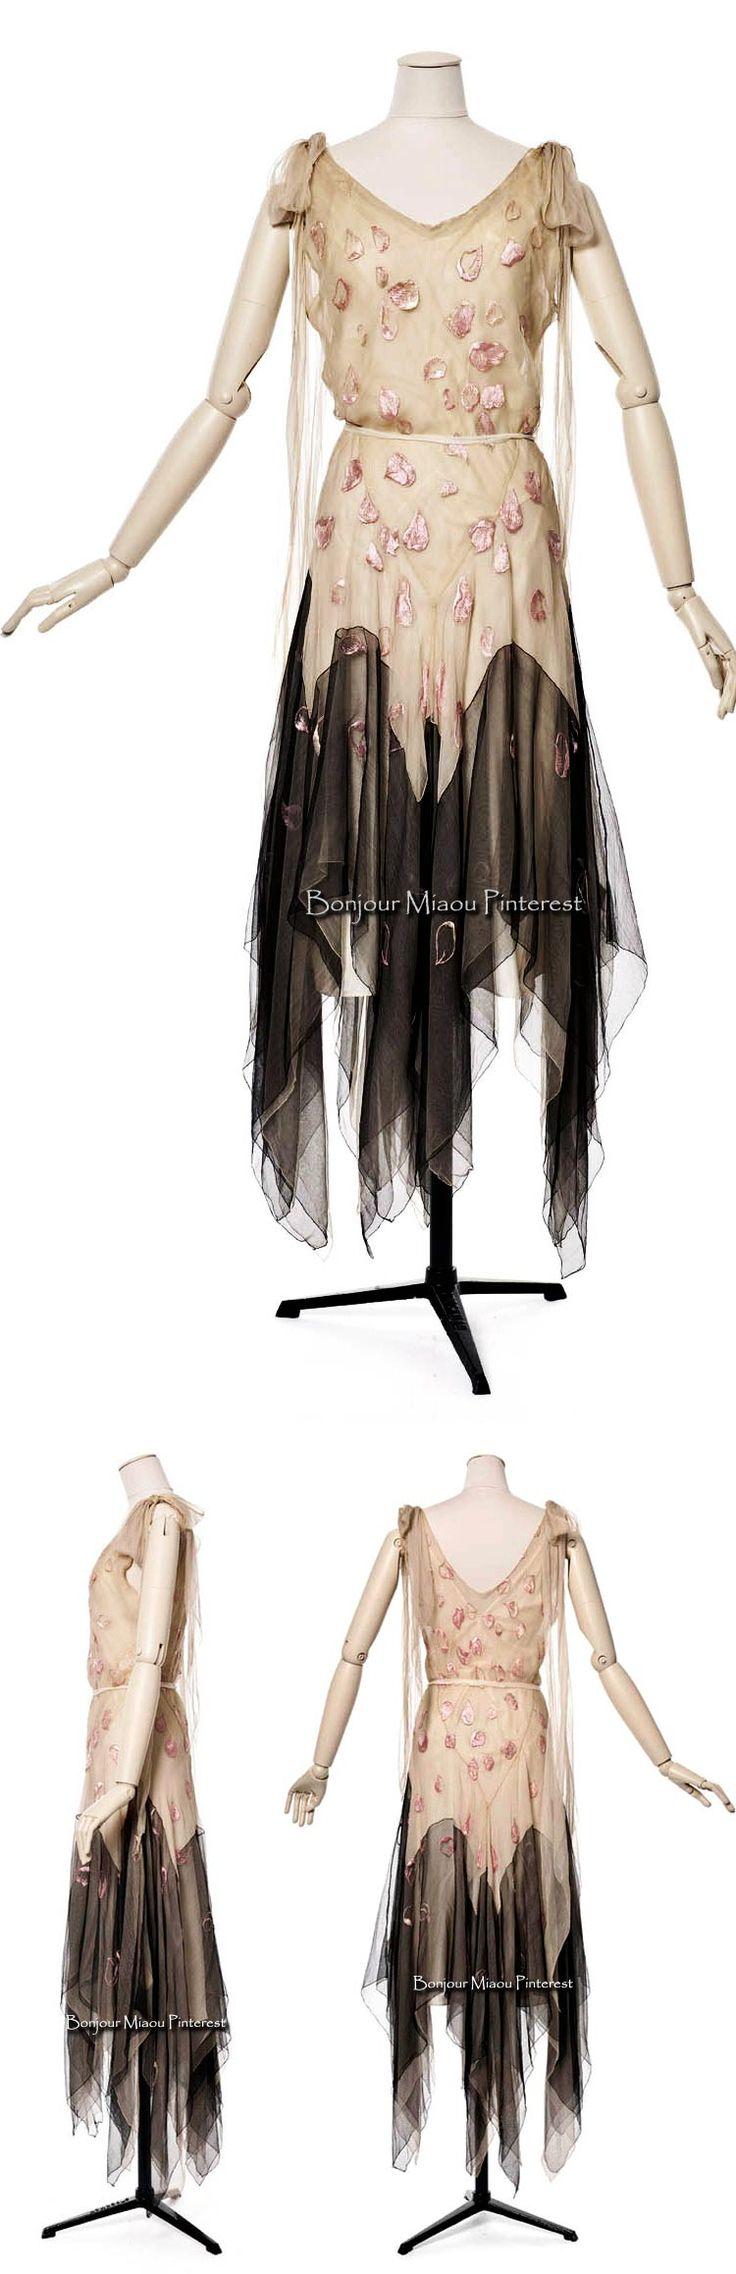 Evening dress, Vionnet, 1929. Silk gauze with silk embroidery. Photos: Jean Tholance. Les Arts Décoratifs via Europeana Fashion